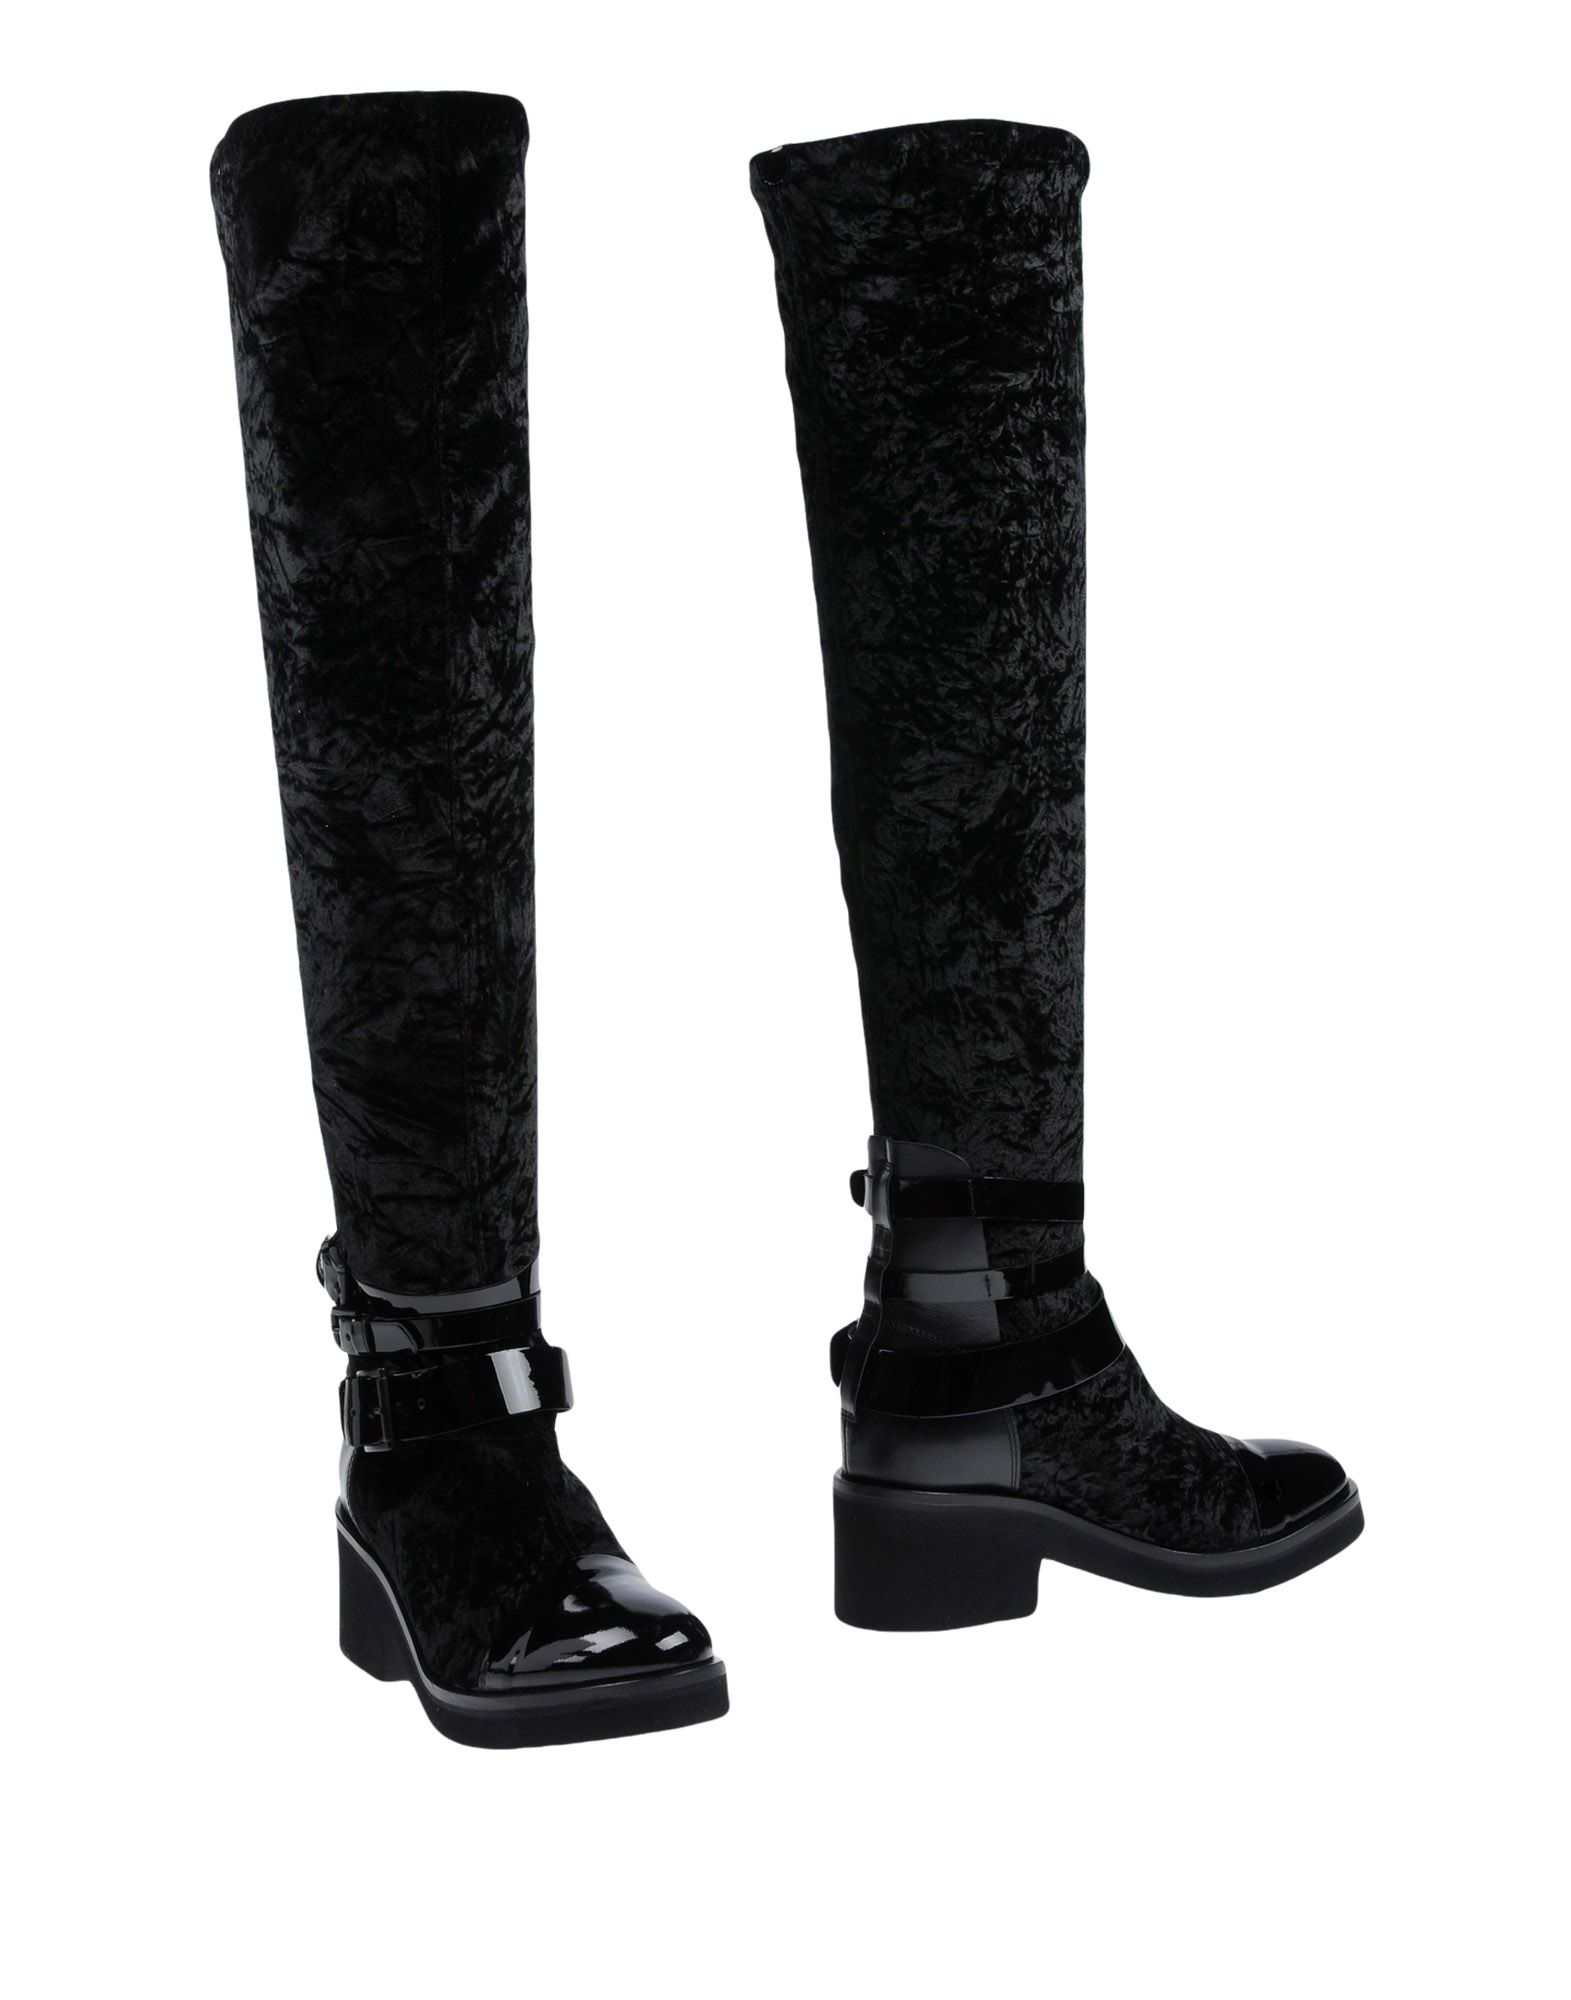 Vic Matiē Stiefel Damen  11457518QUGut aussehende strapazierfähige Schuhe Schuhe Schuhe 4b3a59